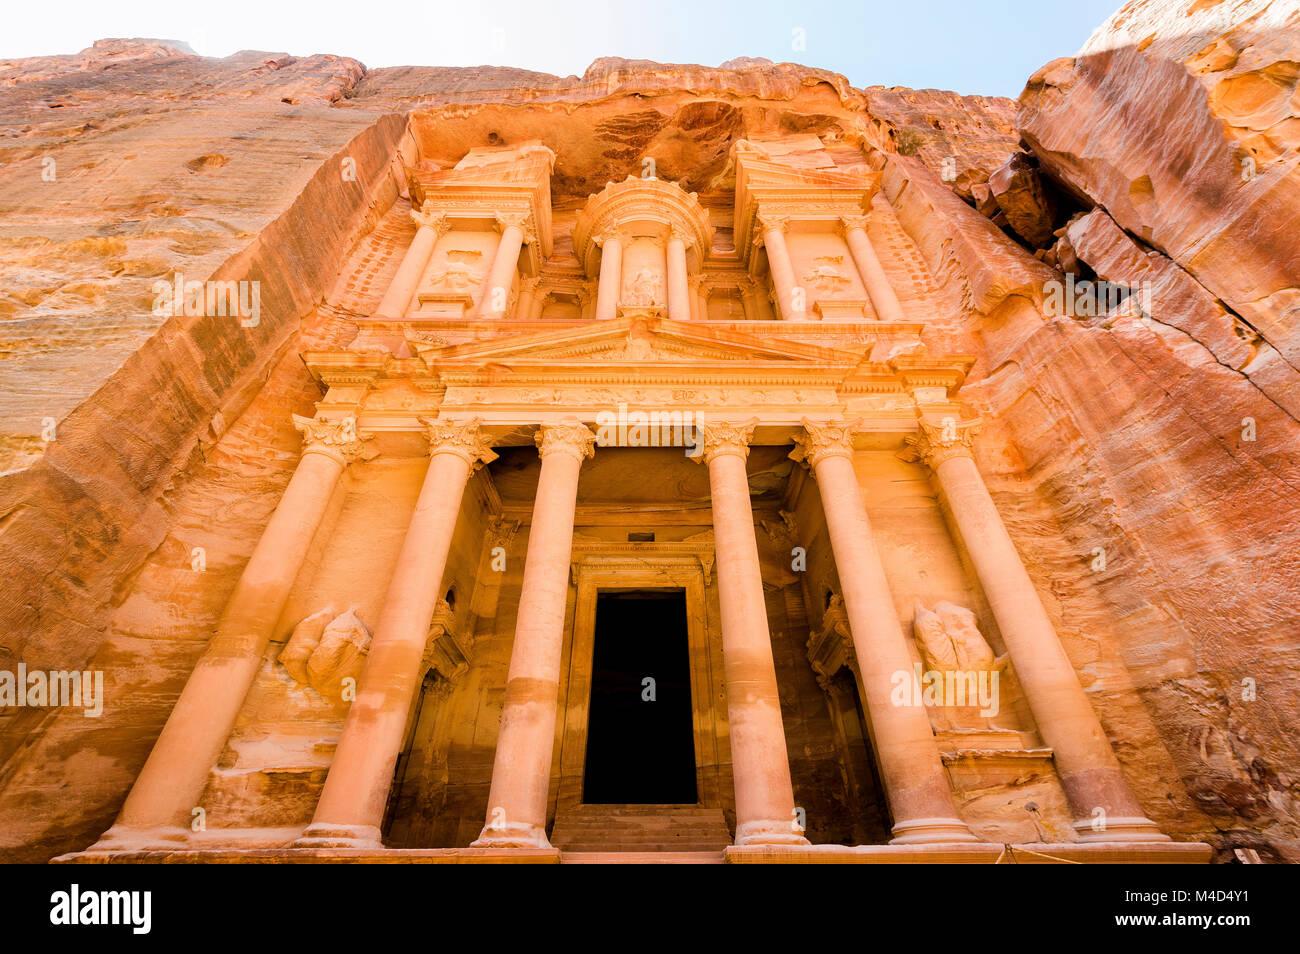 Desert life in Jordan - Stock Image